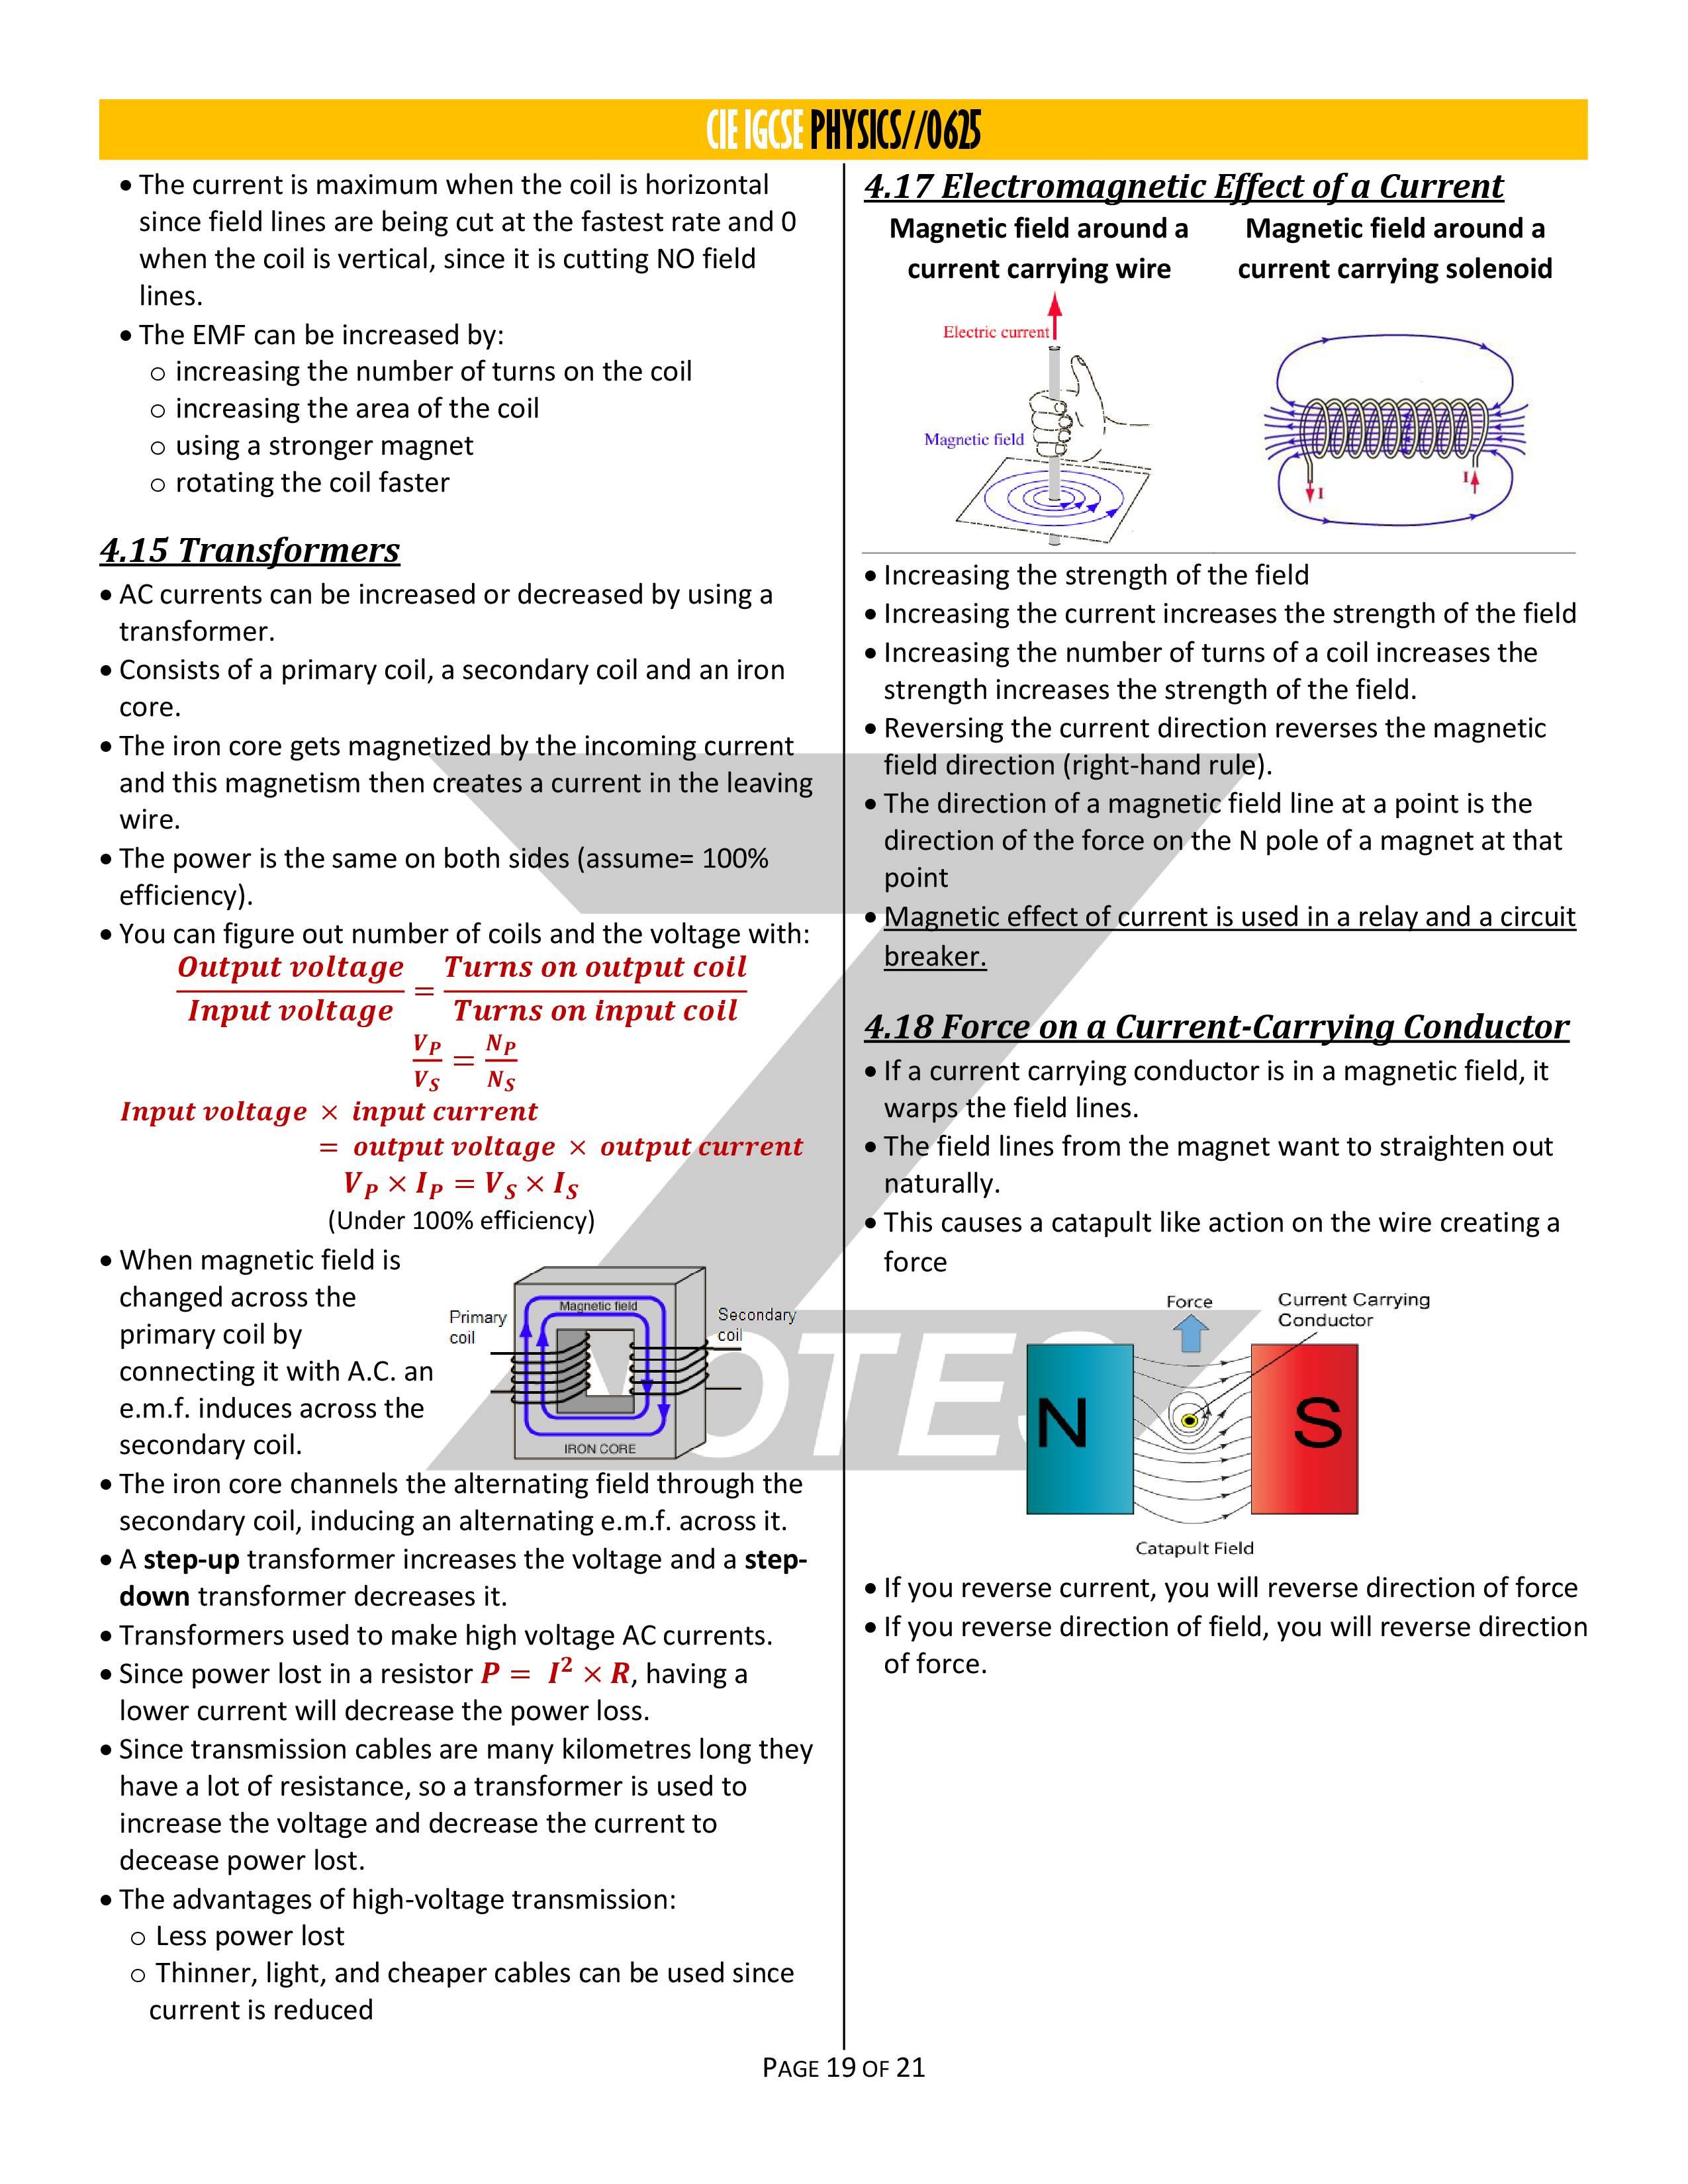 IGCSE Physics Revision Notes   Notes